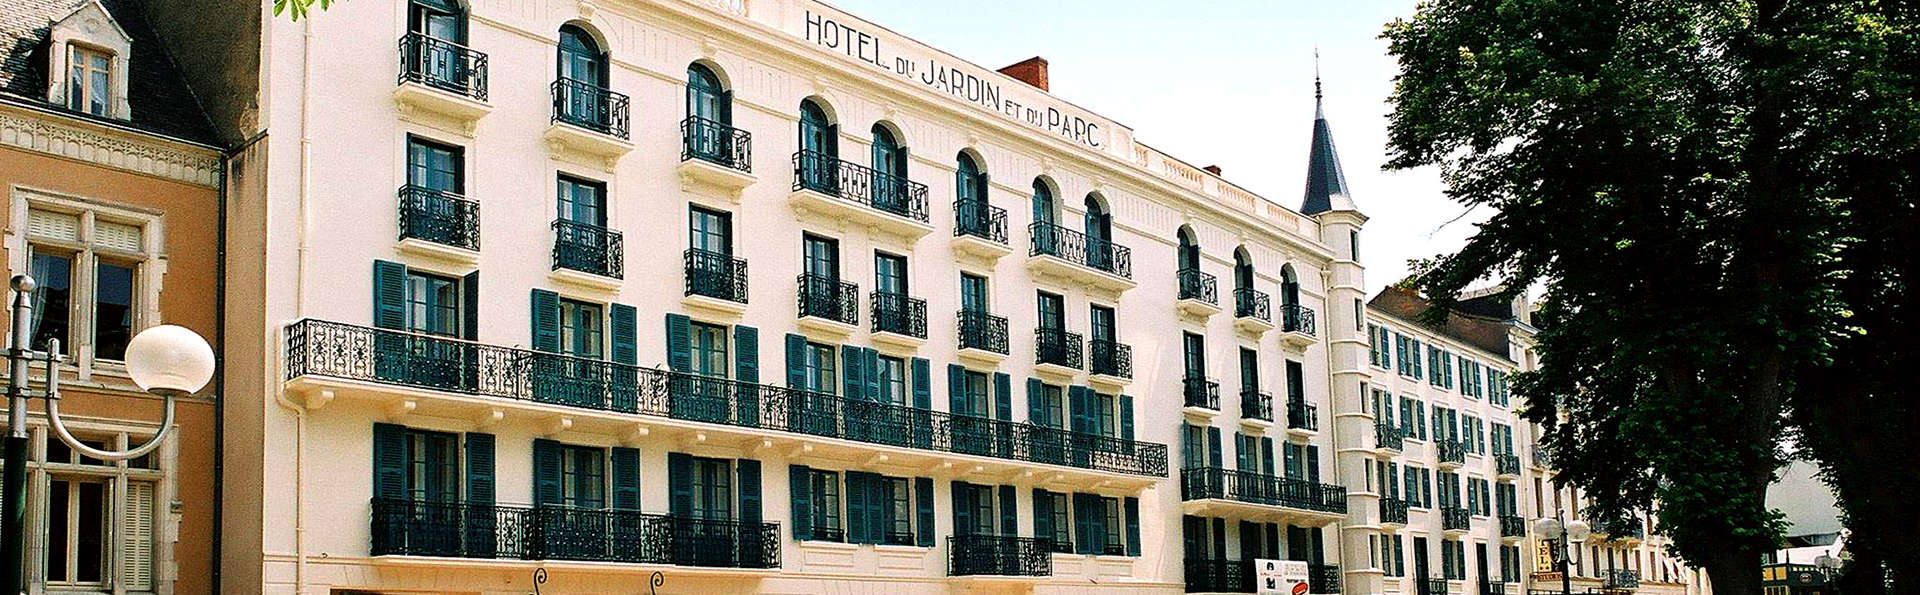 Hôtel Mona Lisa - Néris les bains - Edit_Front.jpg